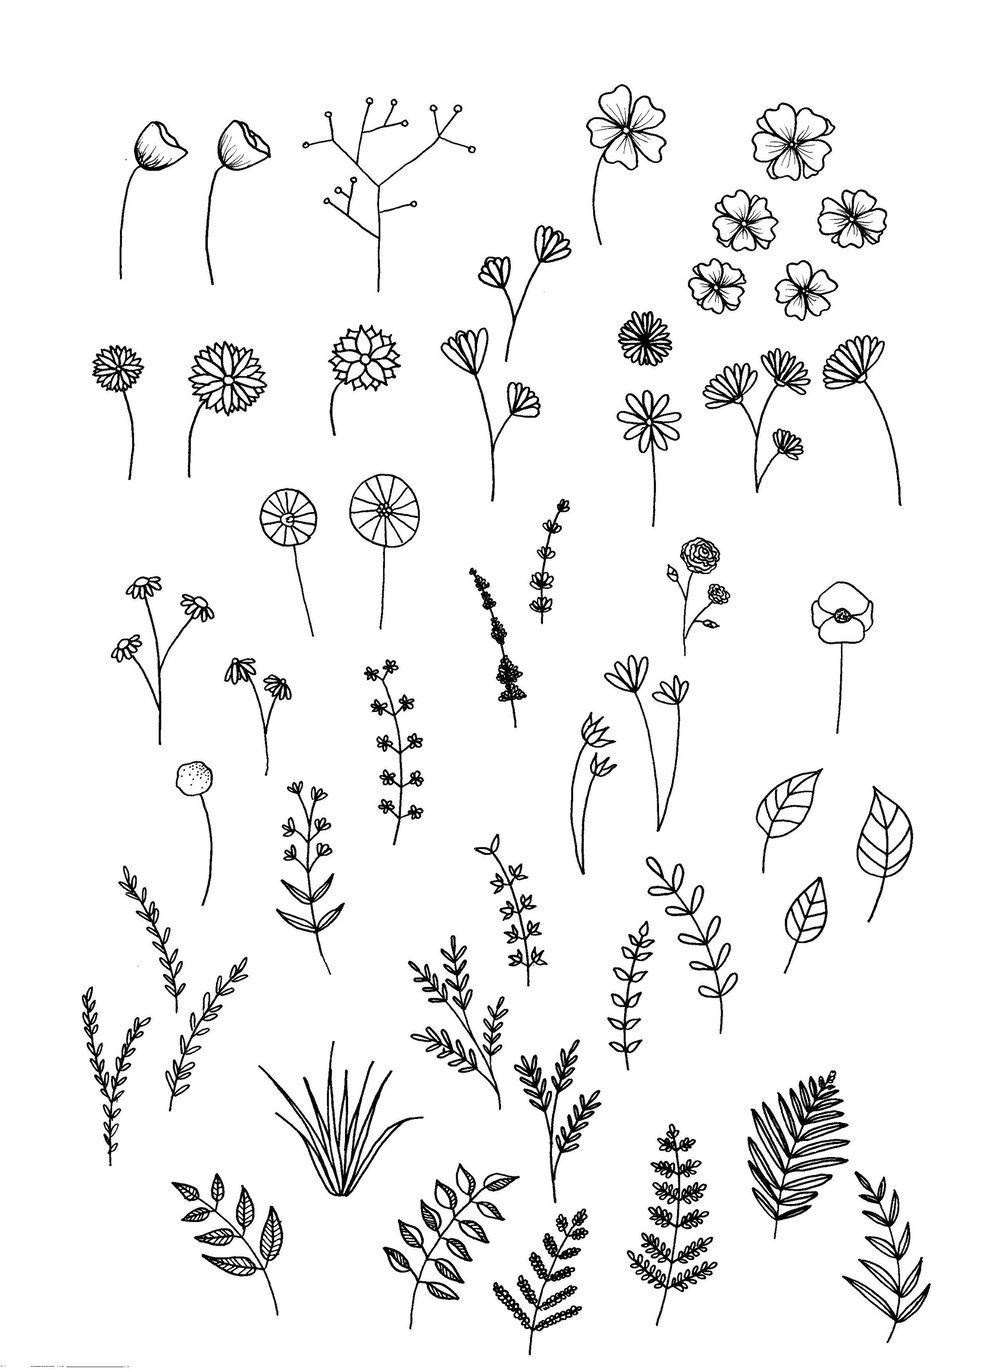 flower and leaf doodles - image 5 - student project